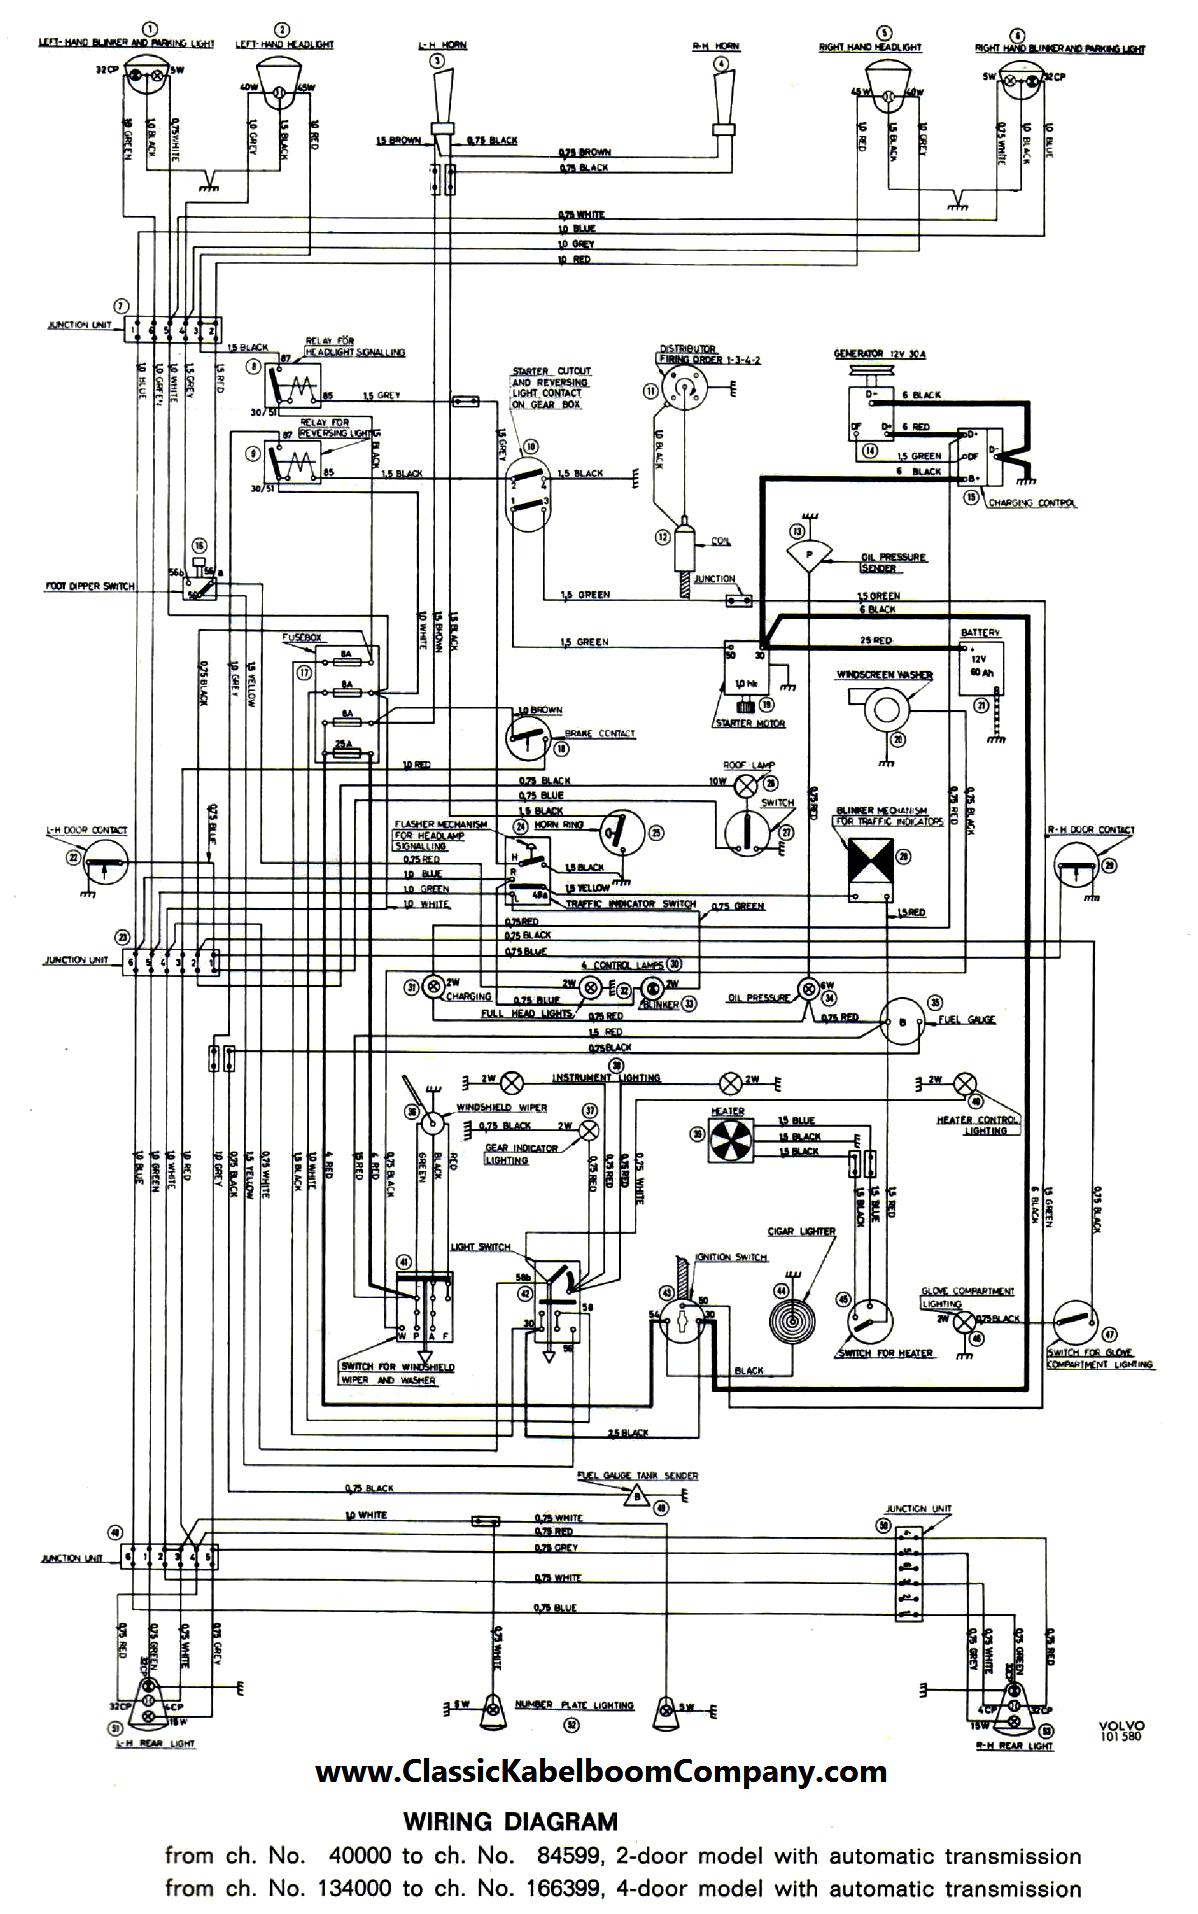 Onan Bf3cr Remote Start Wiring Diagram